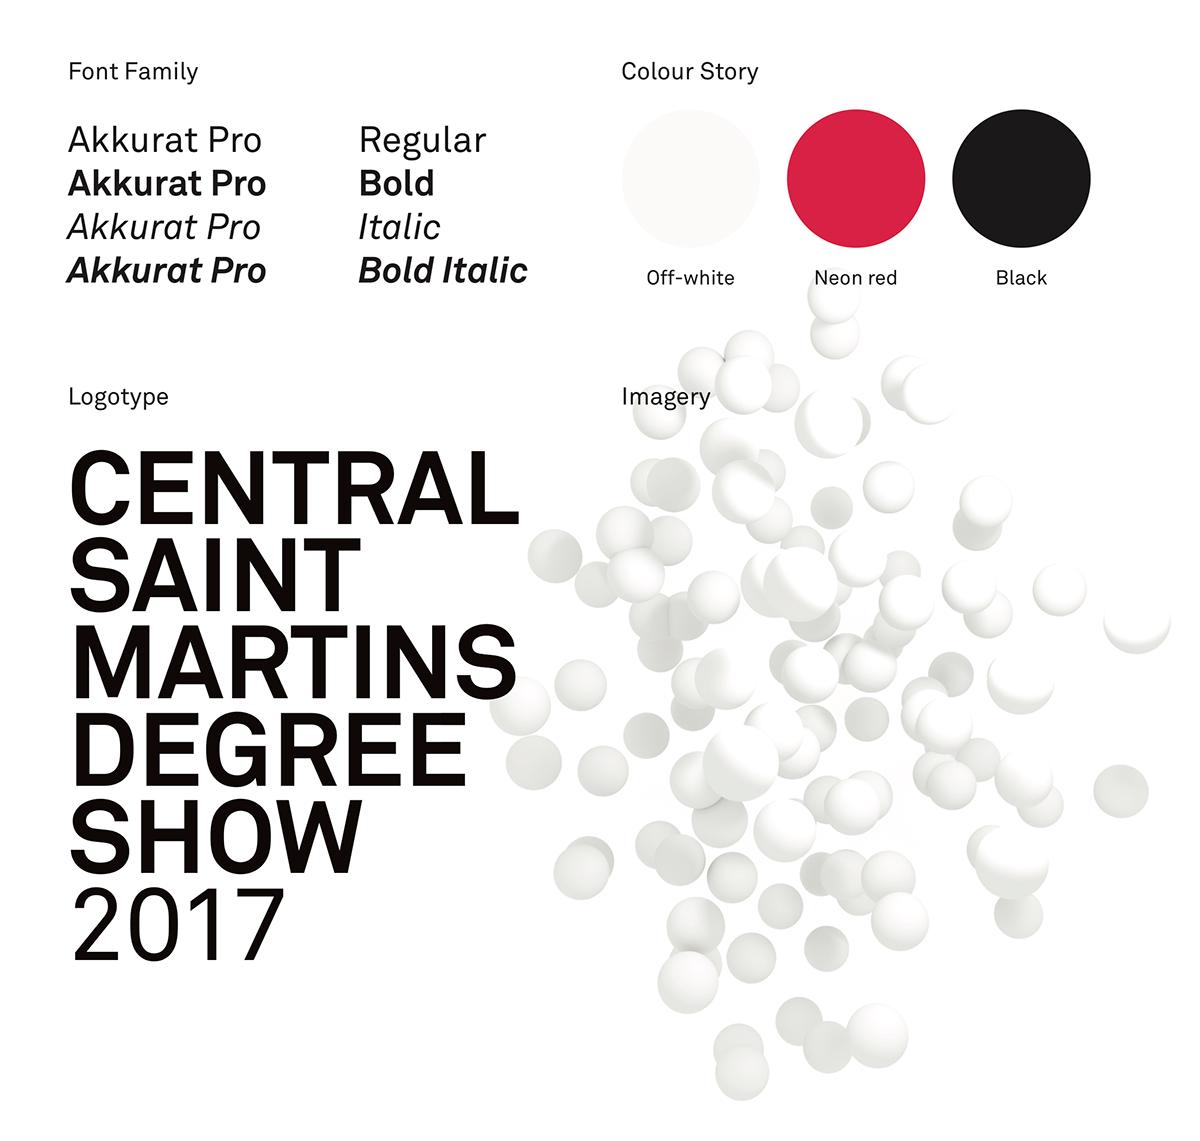 csm central saint martins degree show